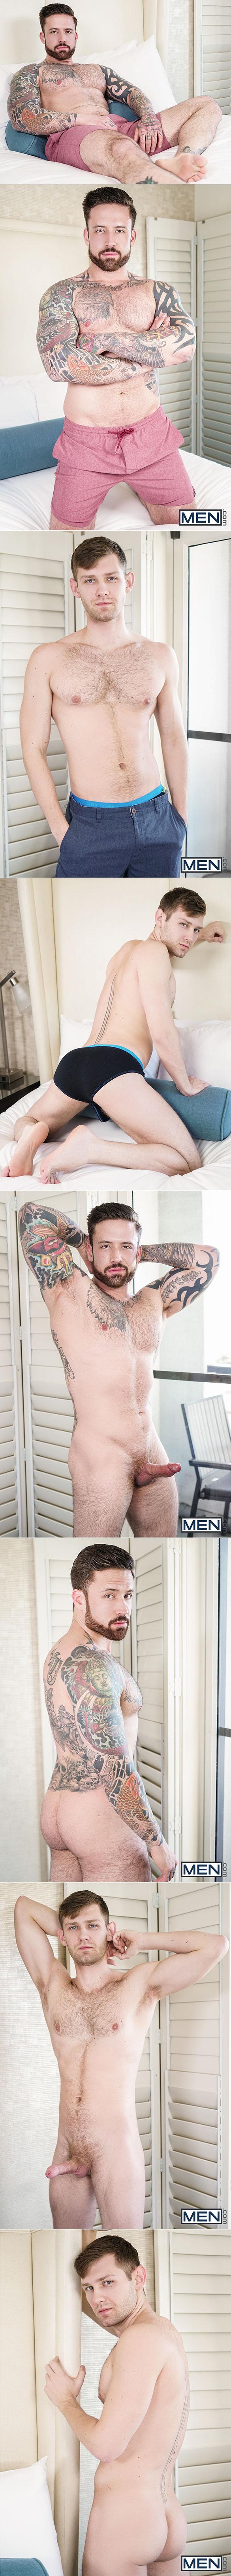 "Men.com: Jacob Peterson rides Jordan Levine in ""Honeymoon for One, Part 1"""